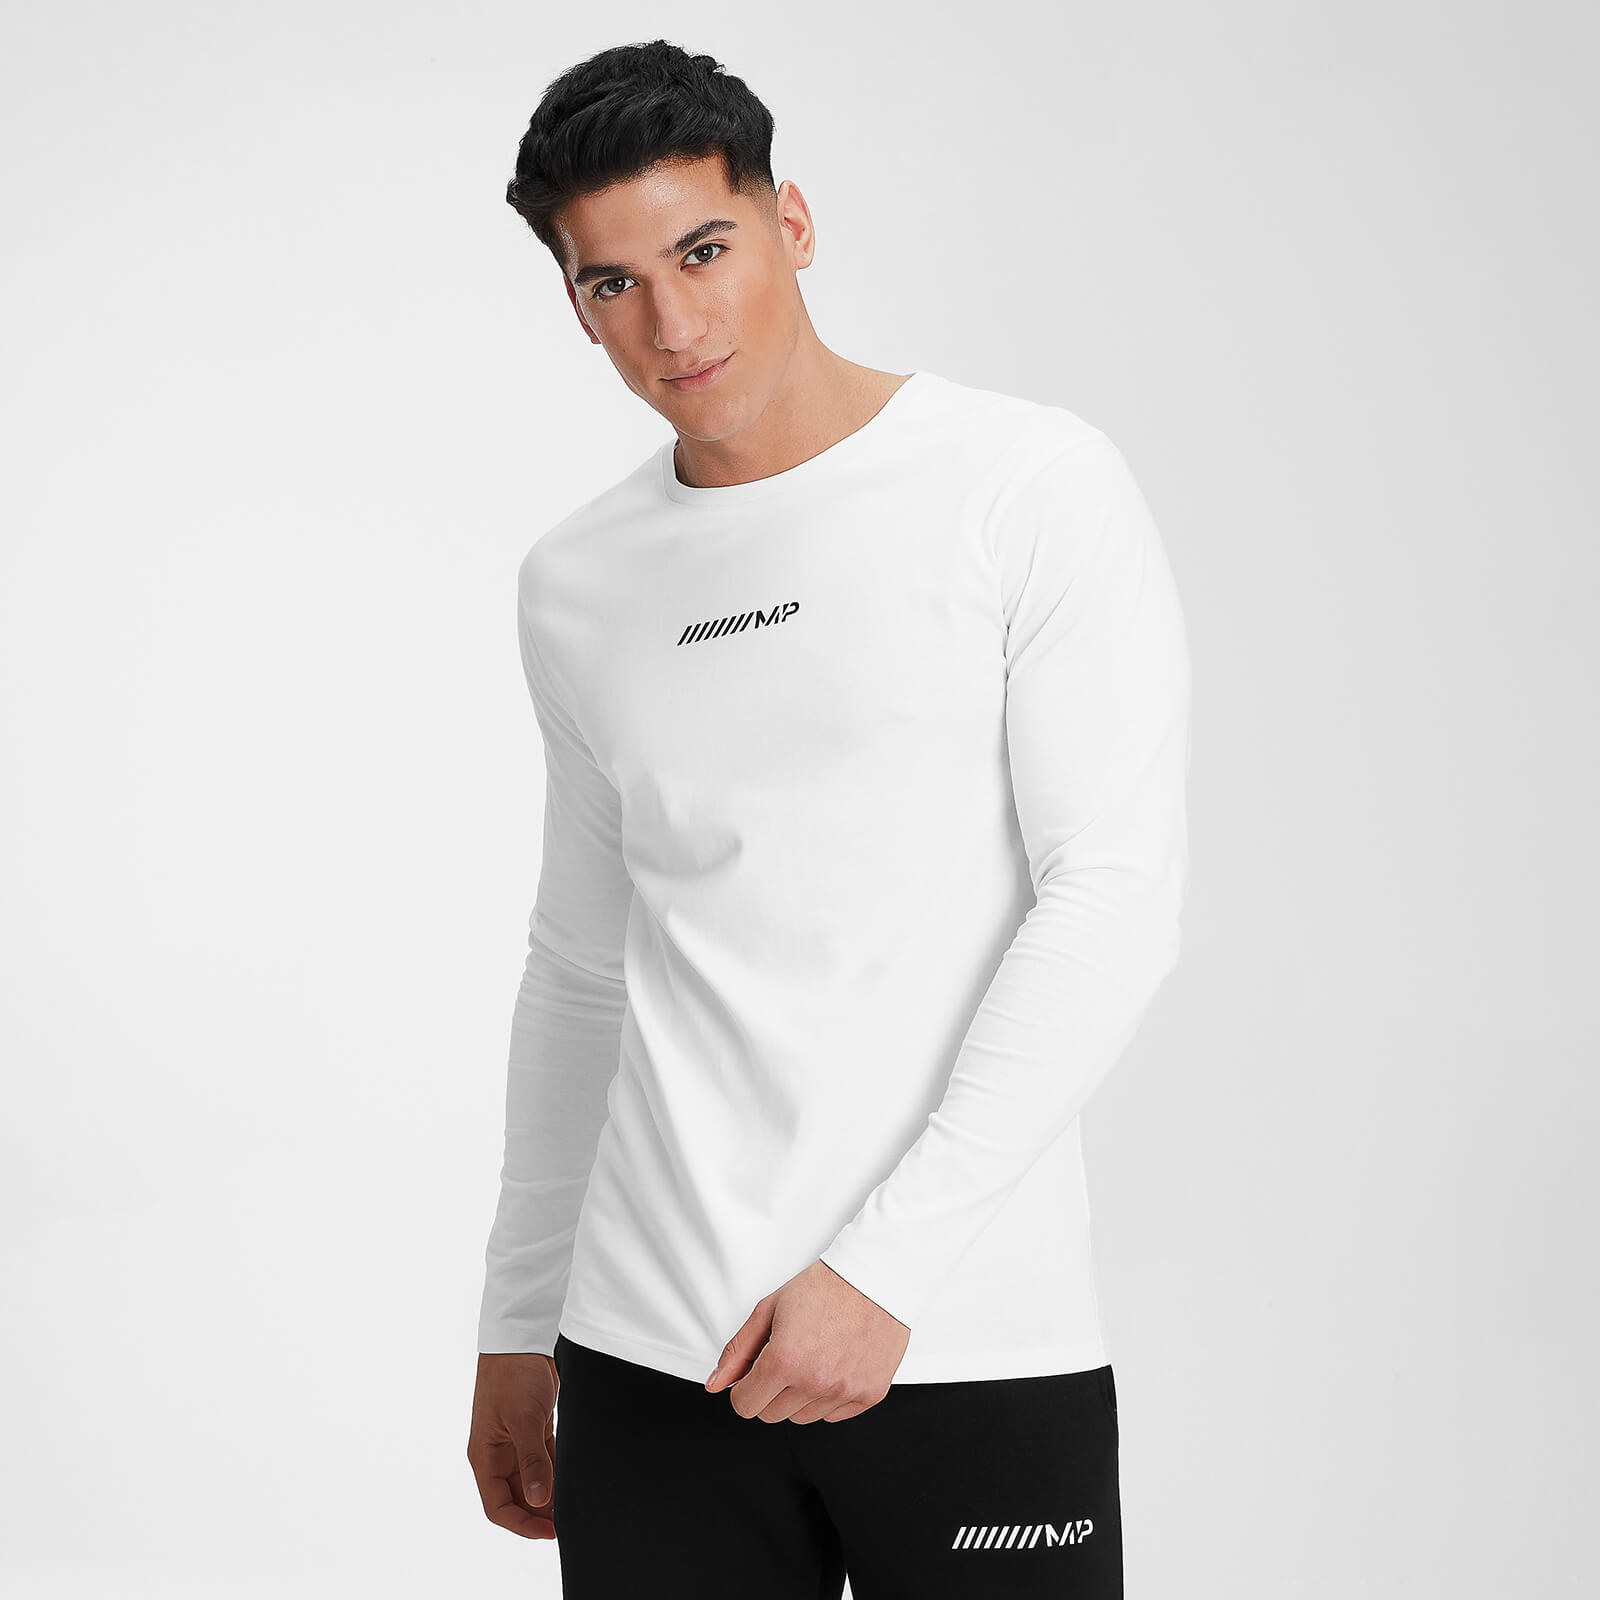 Купить MP Men's Contrast Graphic Long Sleeve Top - White - XXS, Myprotein International